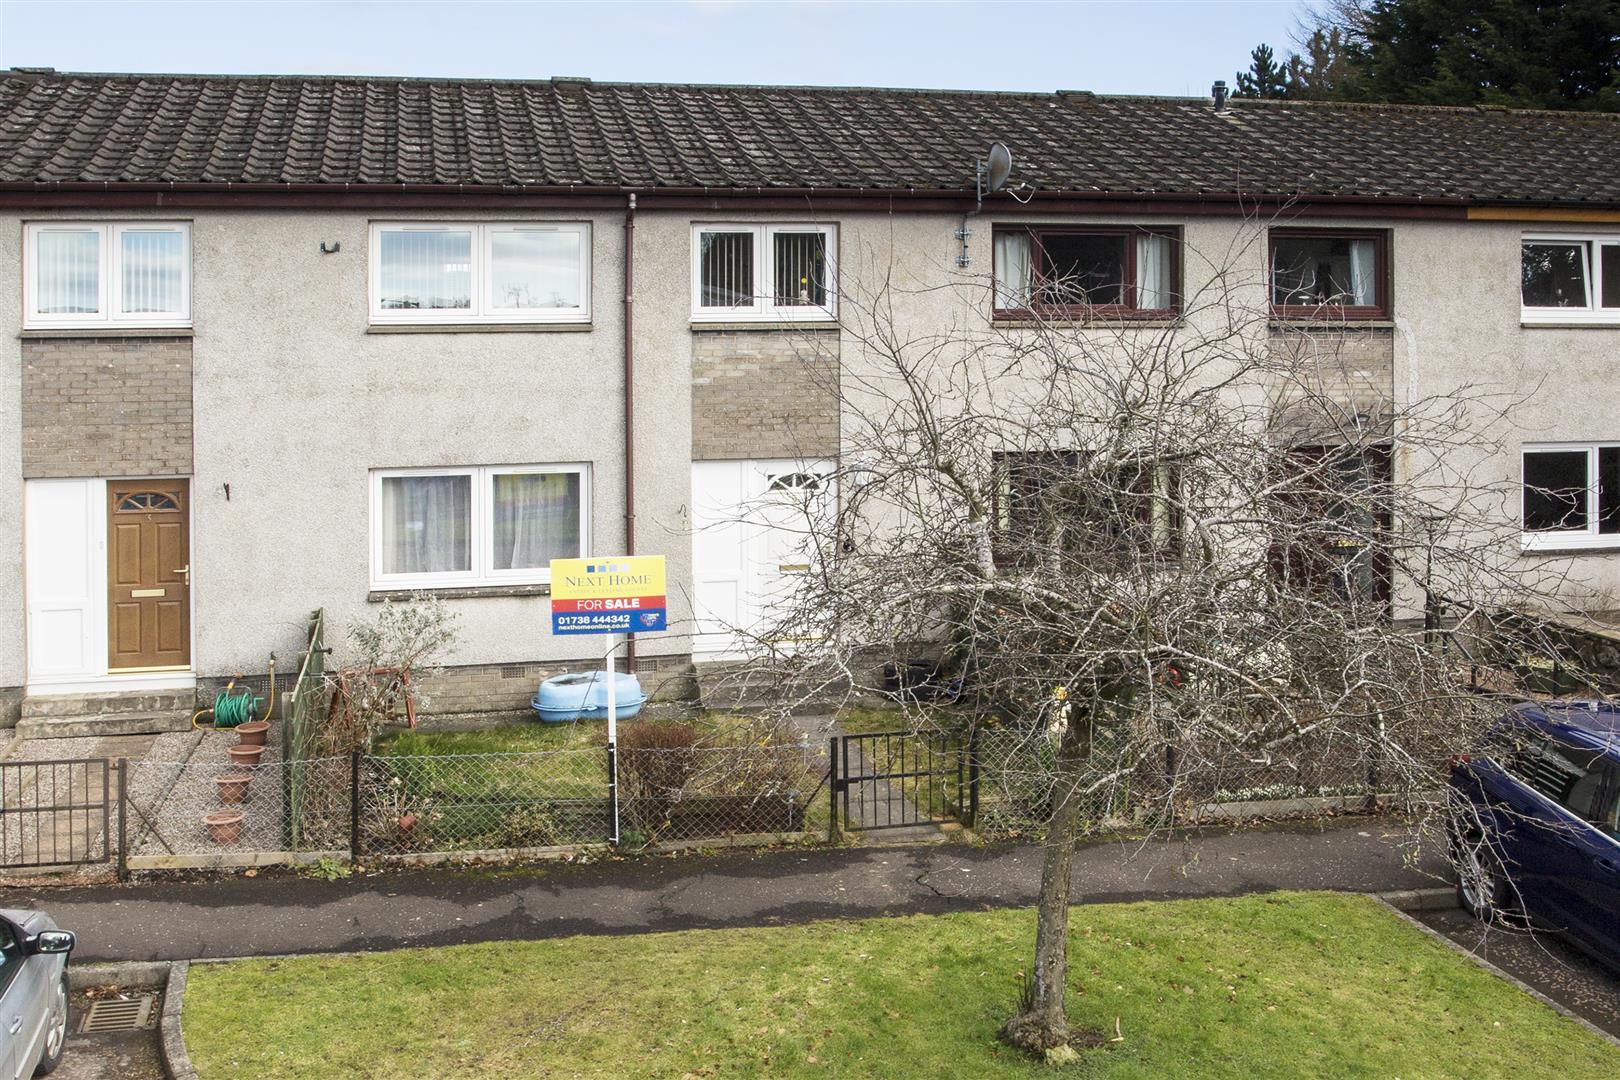 5, Park Terrace, Aberuthven, Auchterarder, Perthshire, PH3 1HU, UK